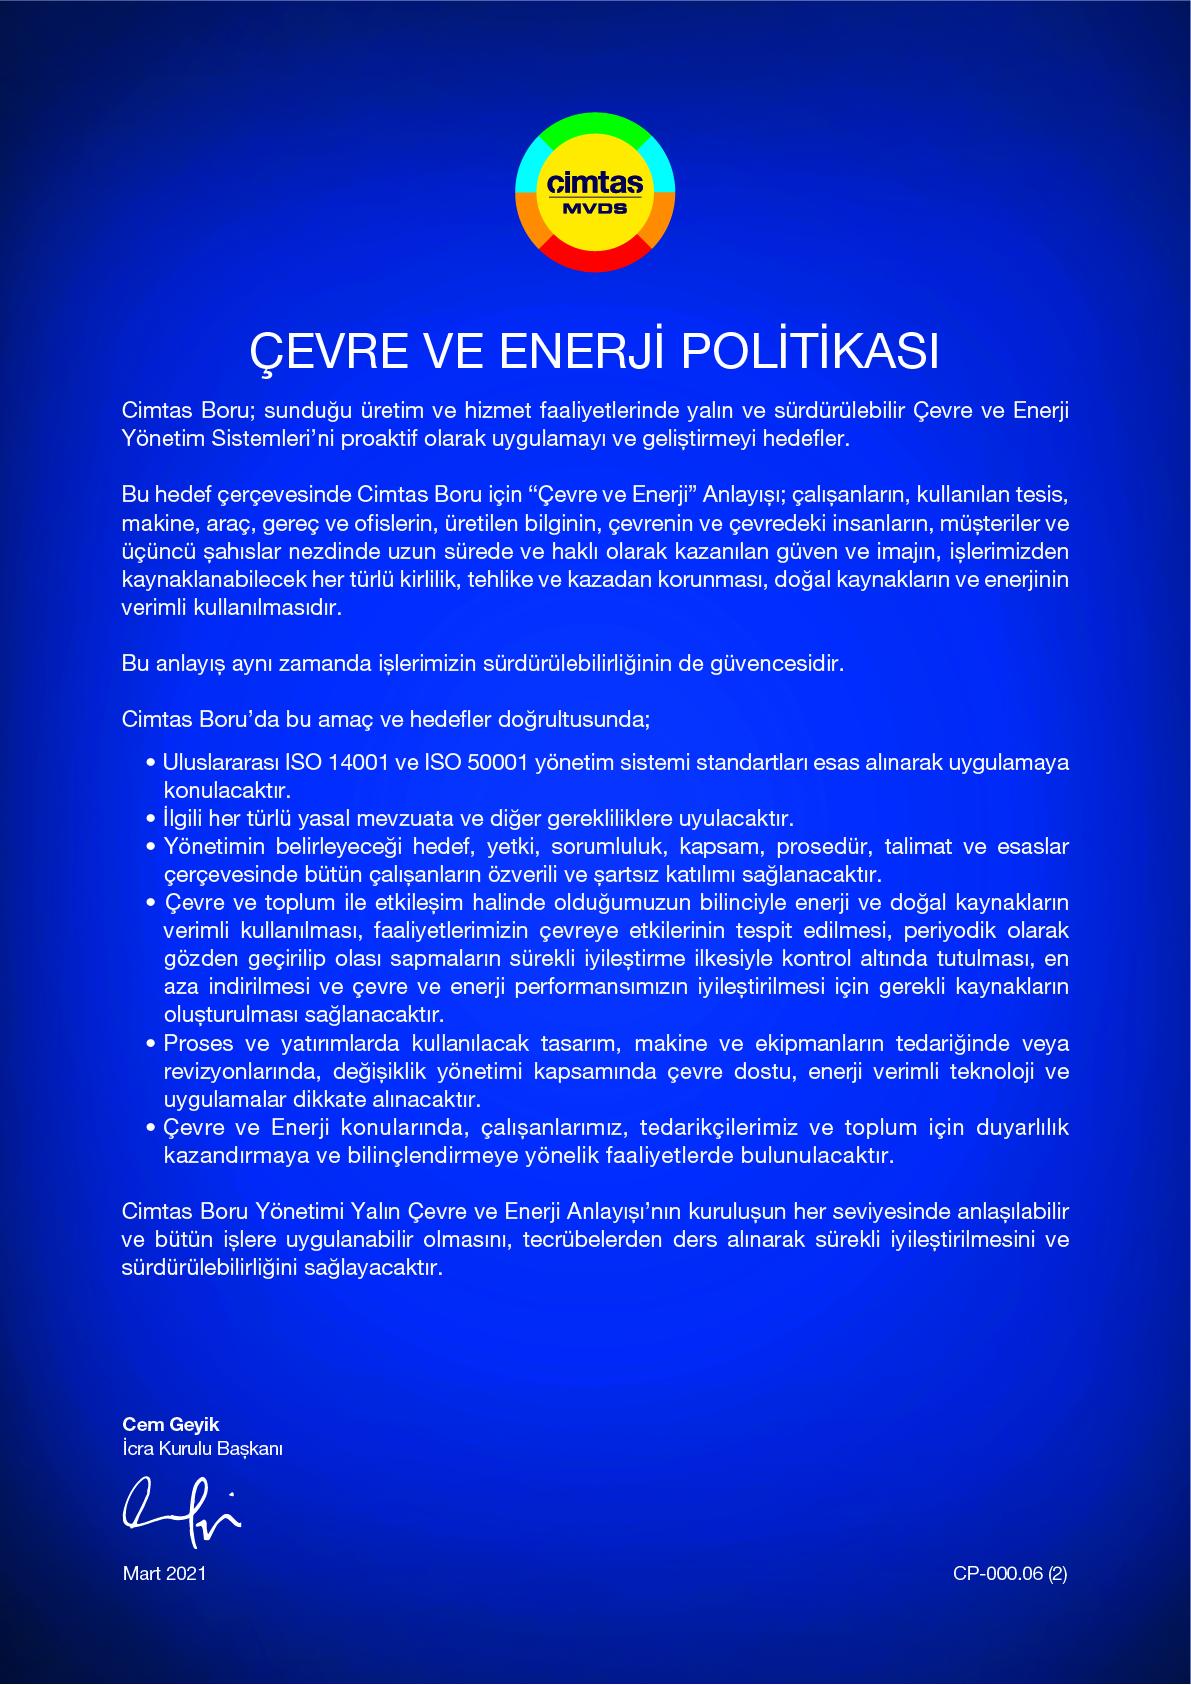 CevrePolitikasi_0321_TR